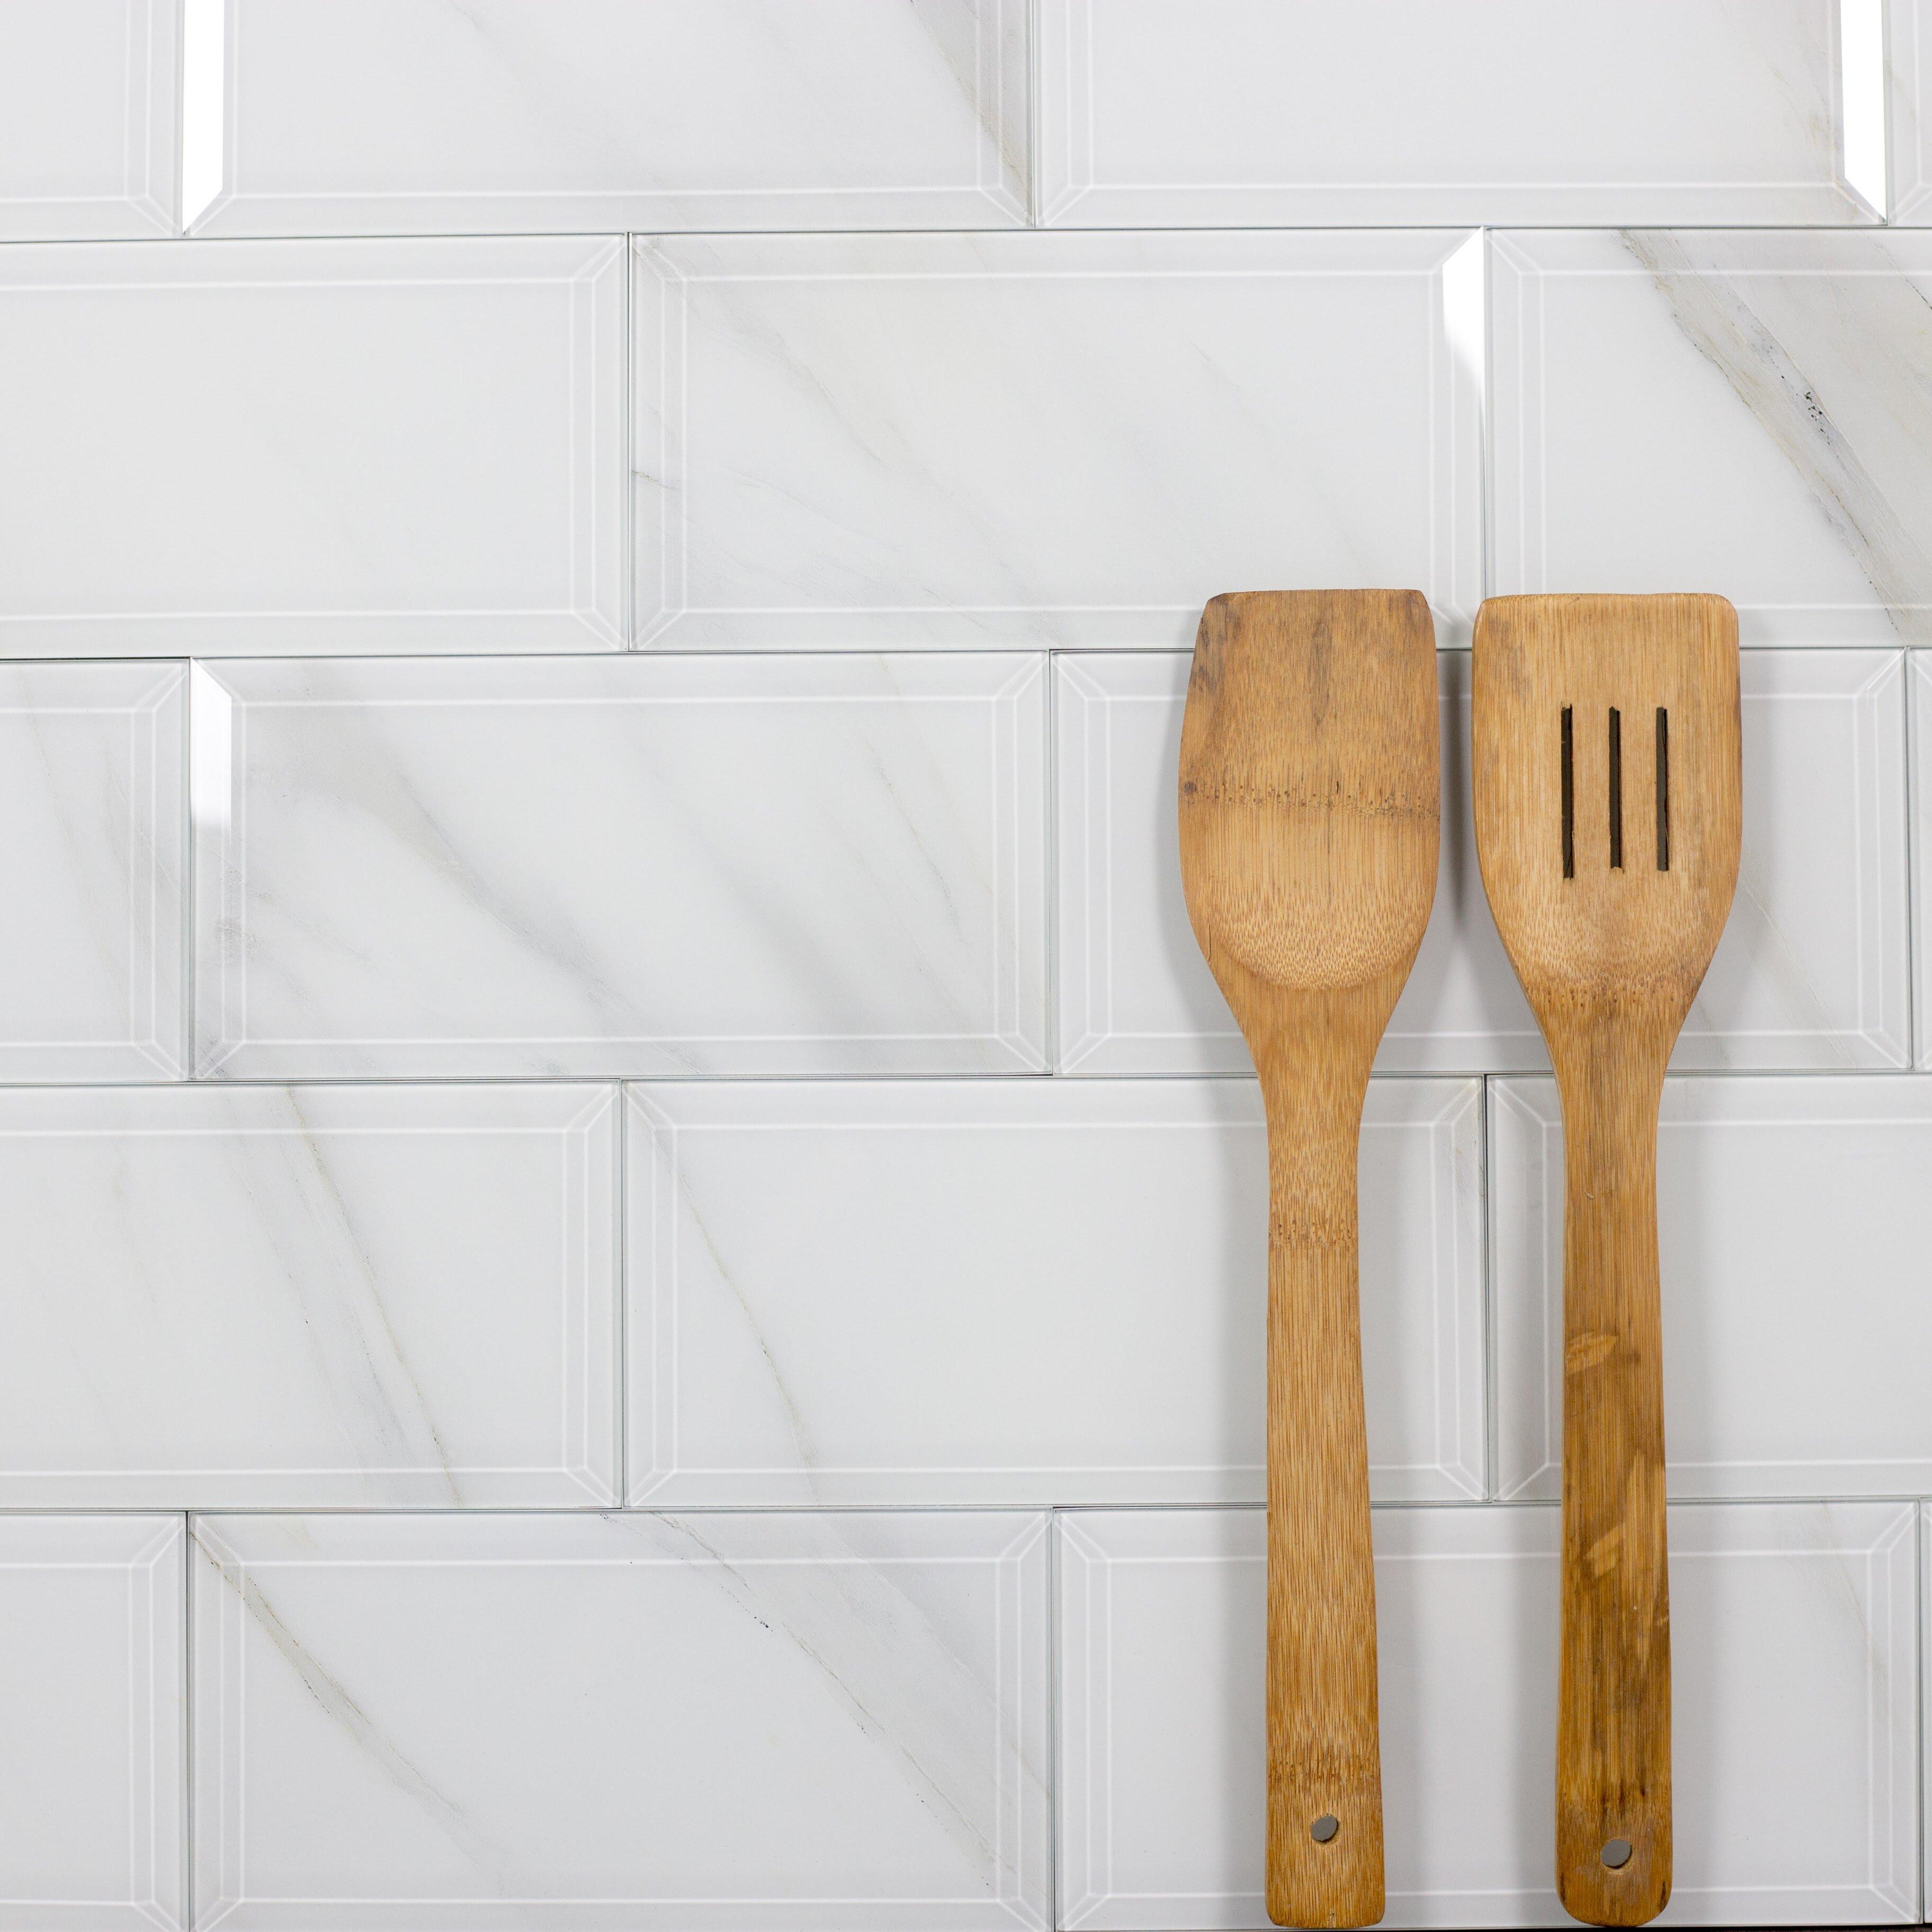 4 x 8 subway tile white image collections tile flooring design ideas white beveled subway tile 4x8 gallery tile flooring design ideas 4 x 8 subway tile white dailygadgetfo Choice Image